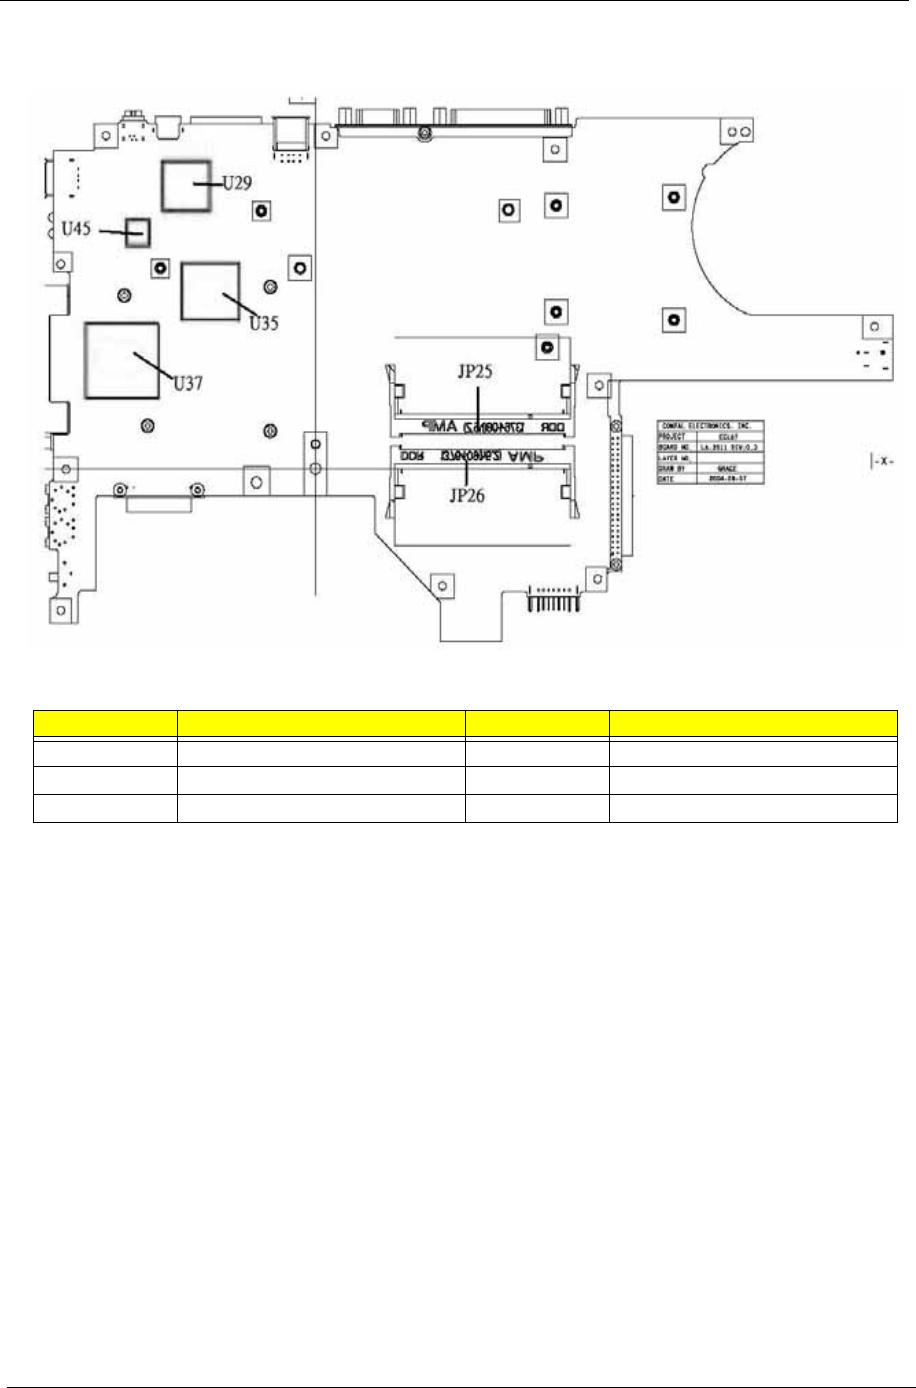 medium resolution of trane bwv724a100d1 air handler wiring diagram wiring library nvis wiring diagram antenna stealth wiring diagram source